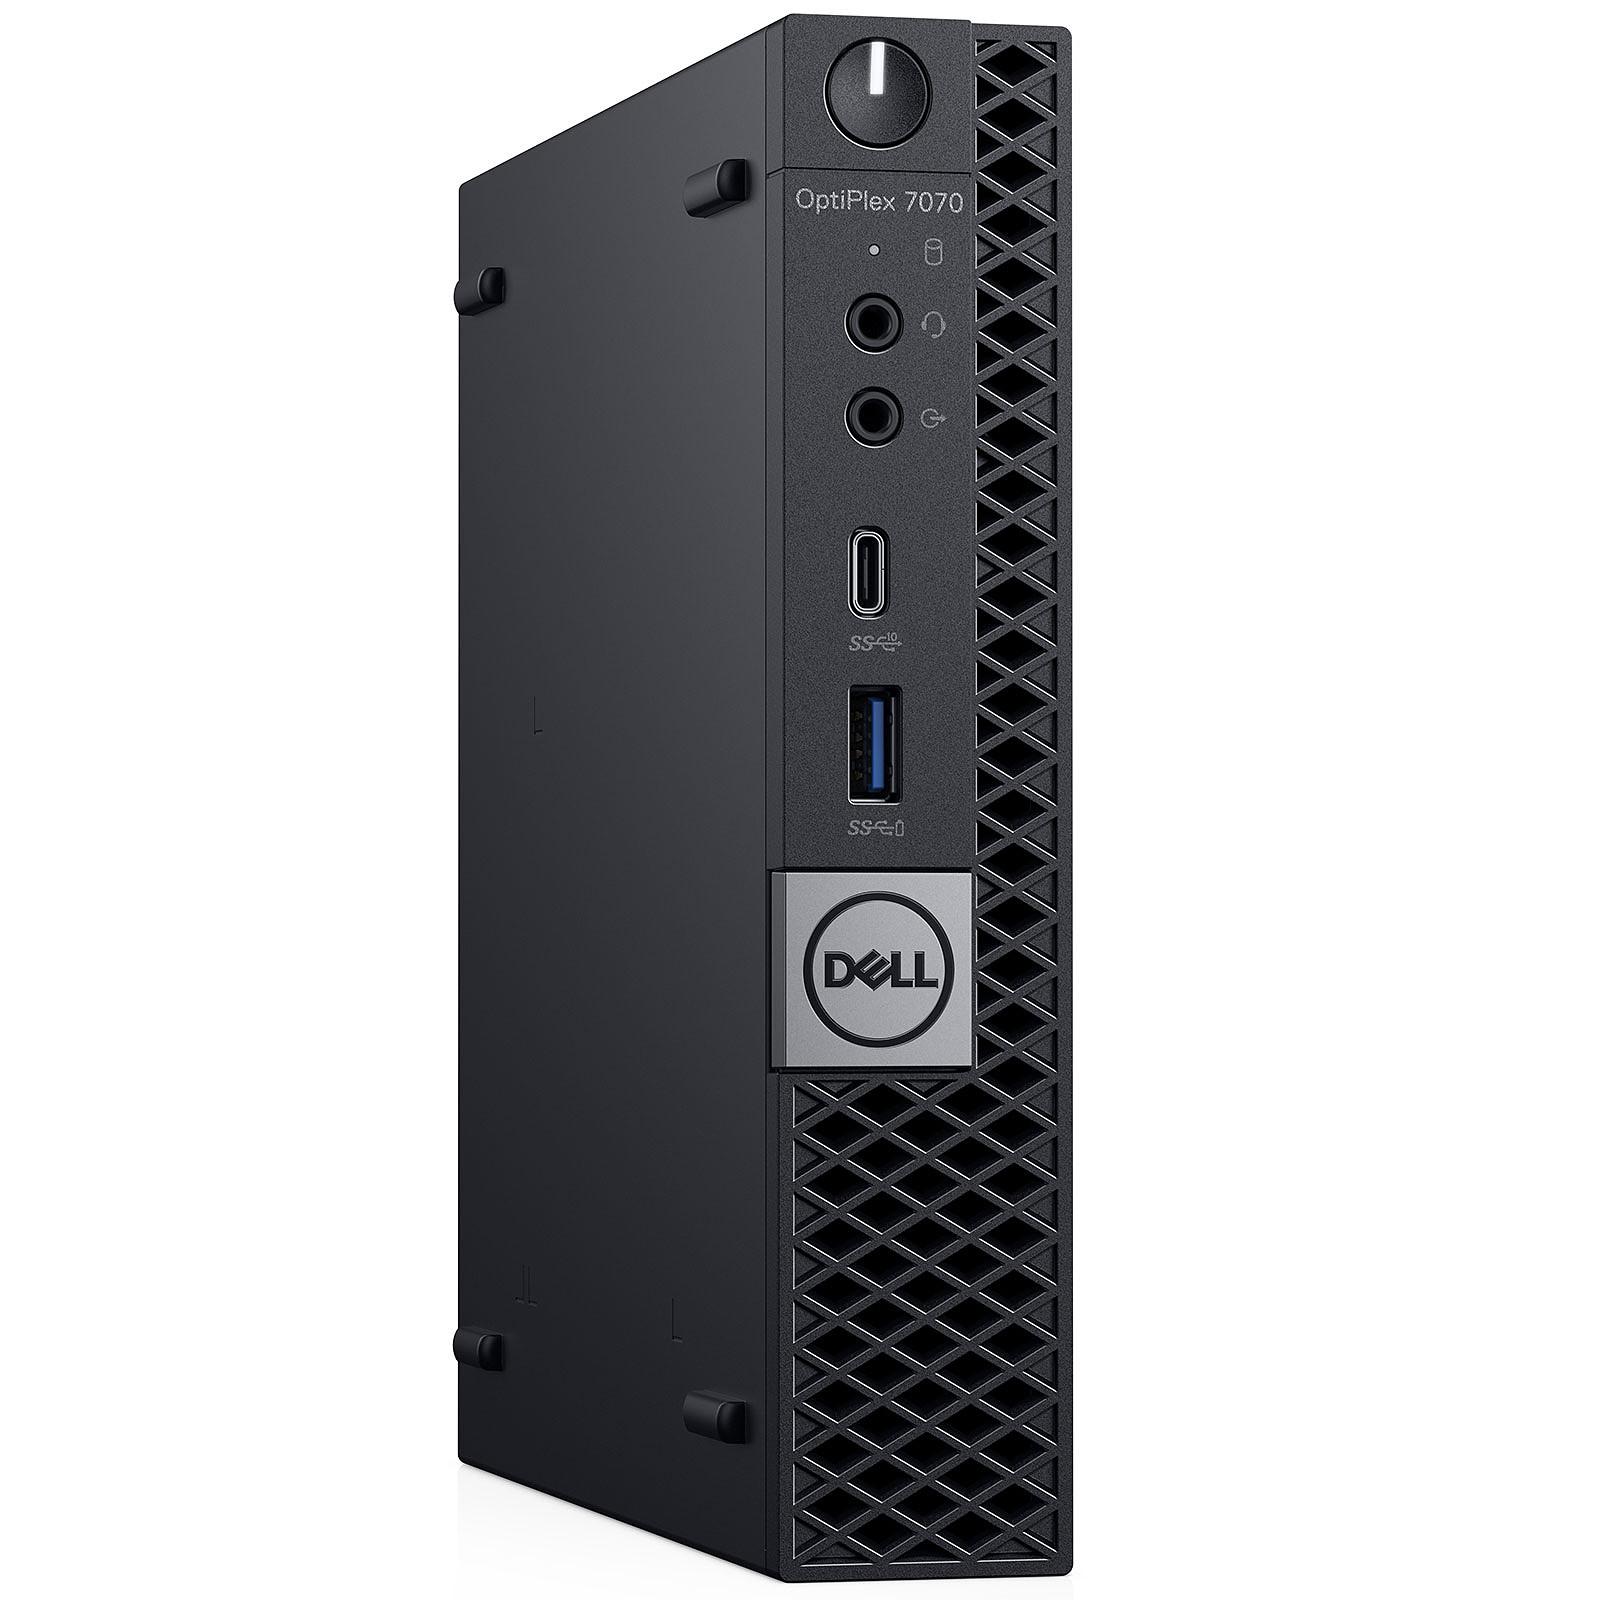 Dell OptiPlex 7070 MFF (F0YGV)